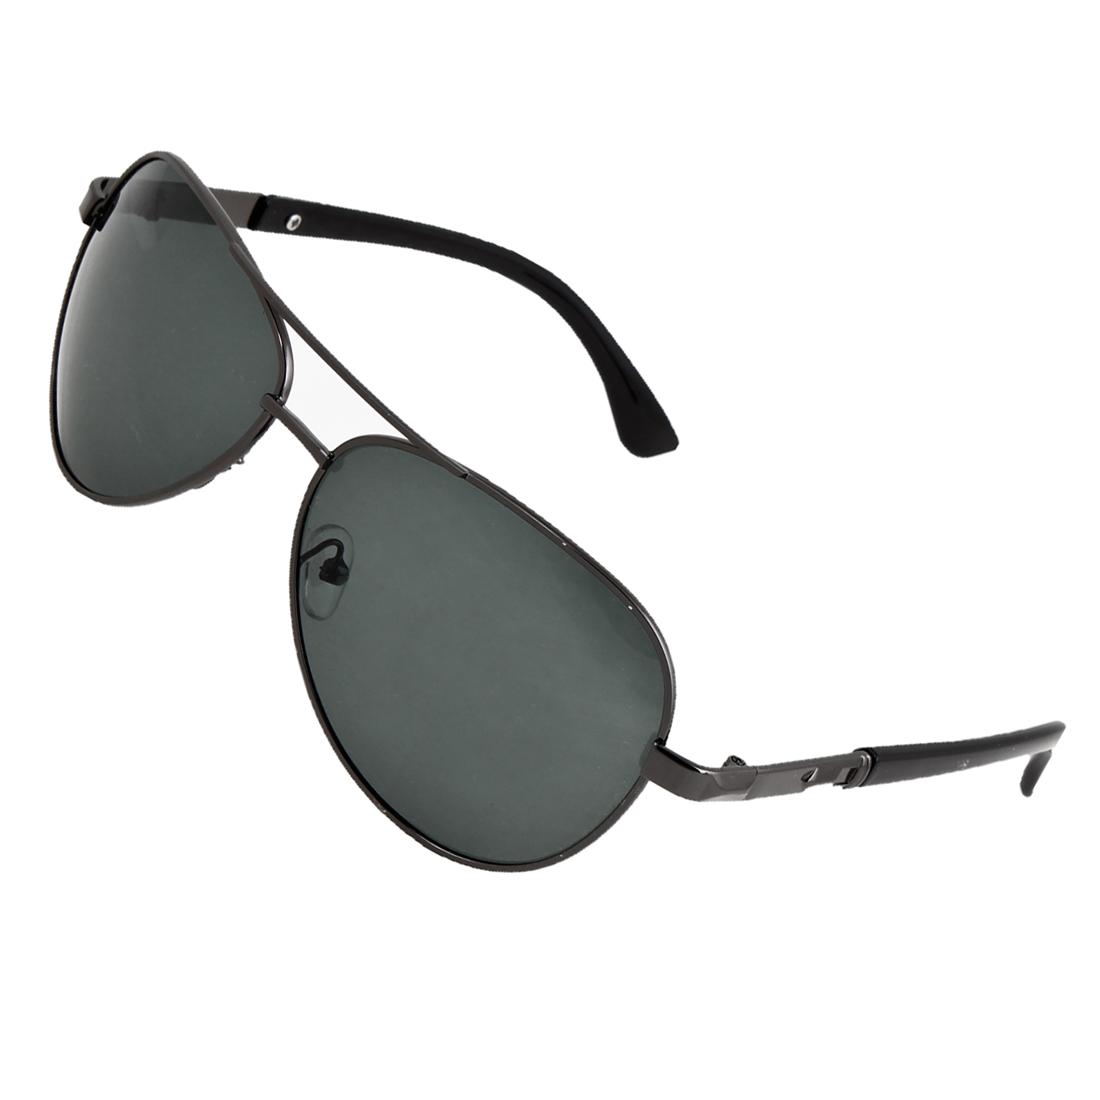 Man Double Bridge Plastic Wrapped Arms Oval Lens Polarized Sunglasses w Case